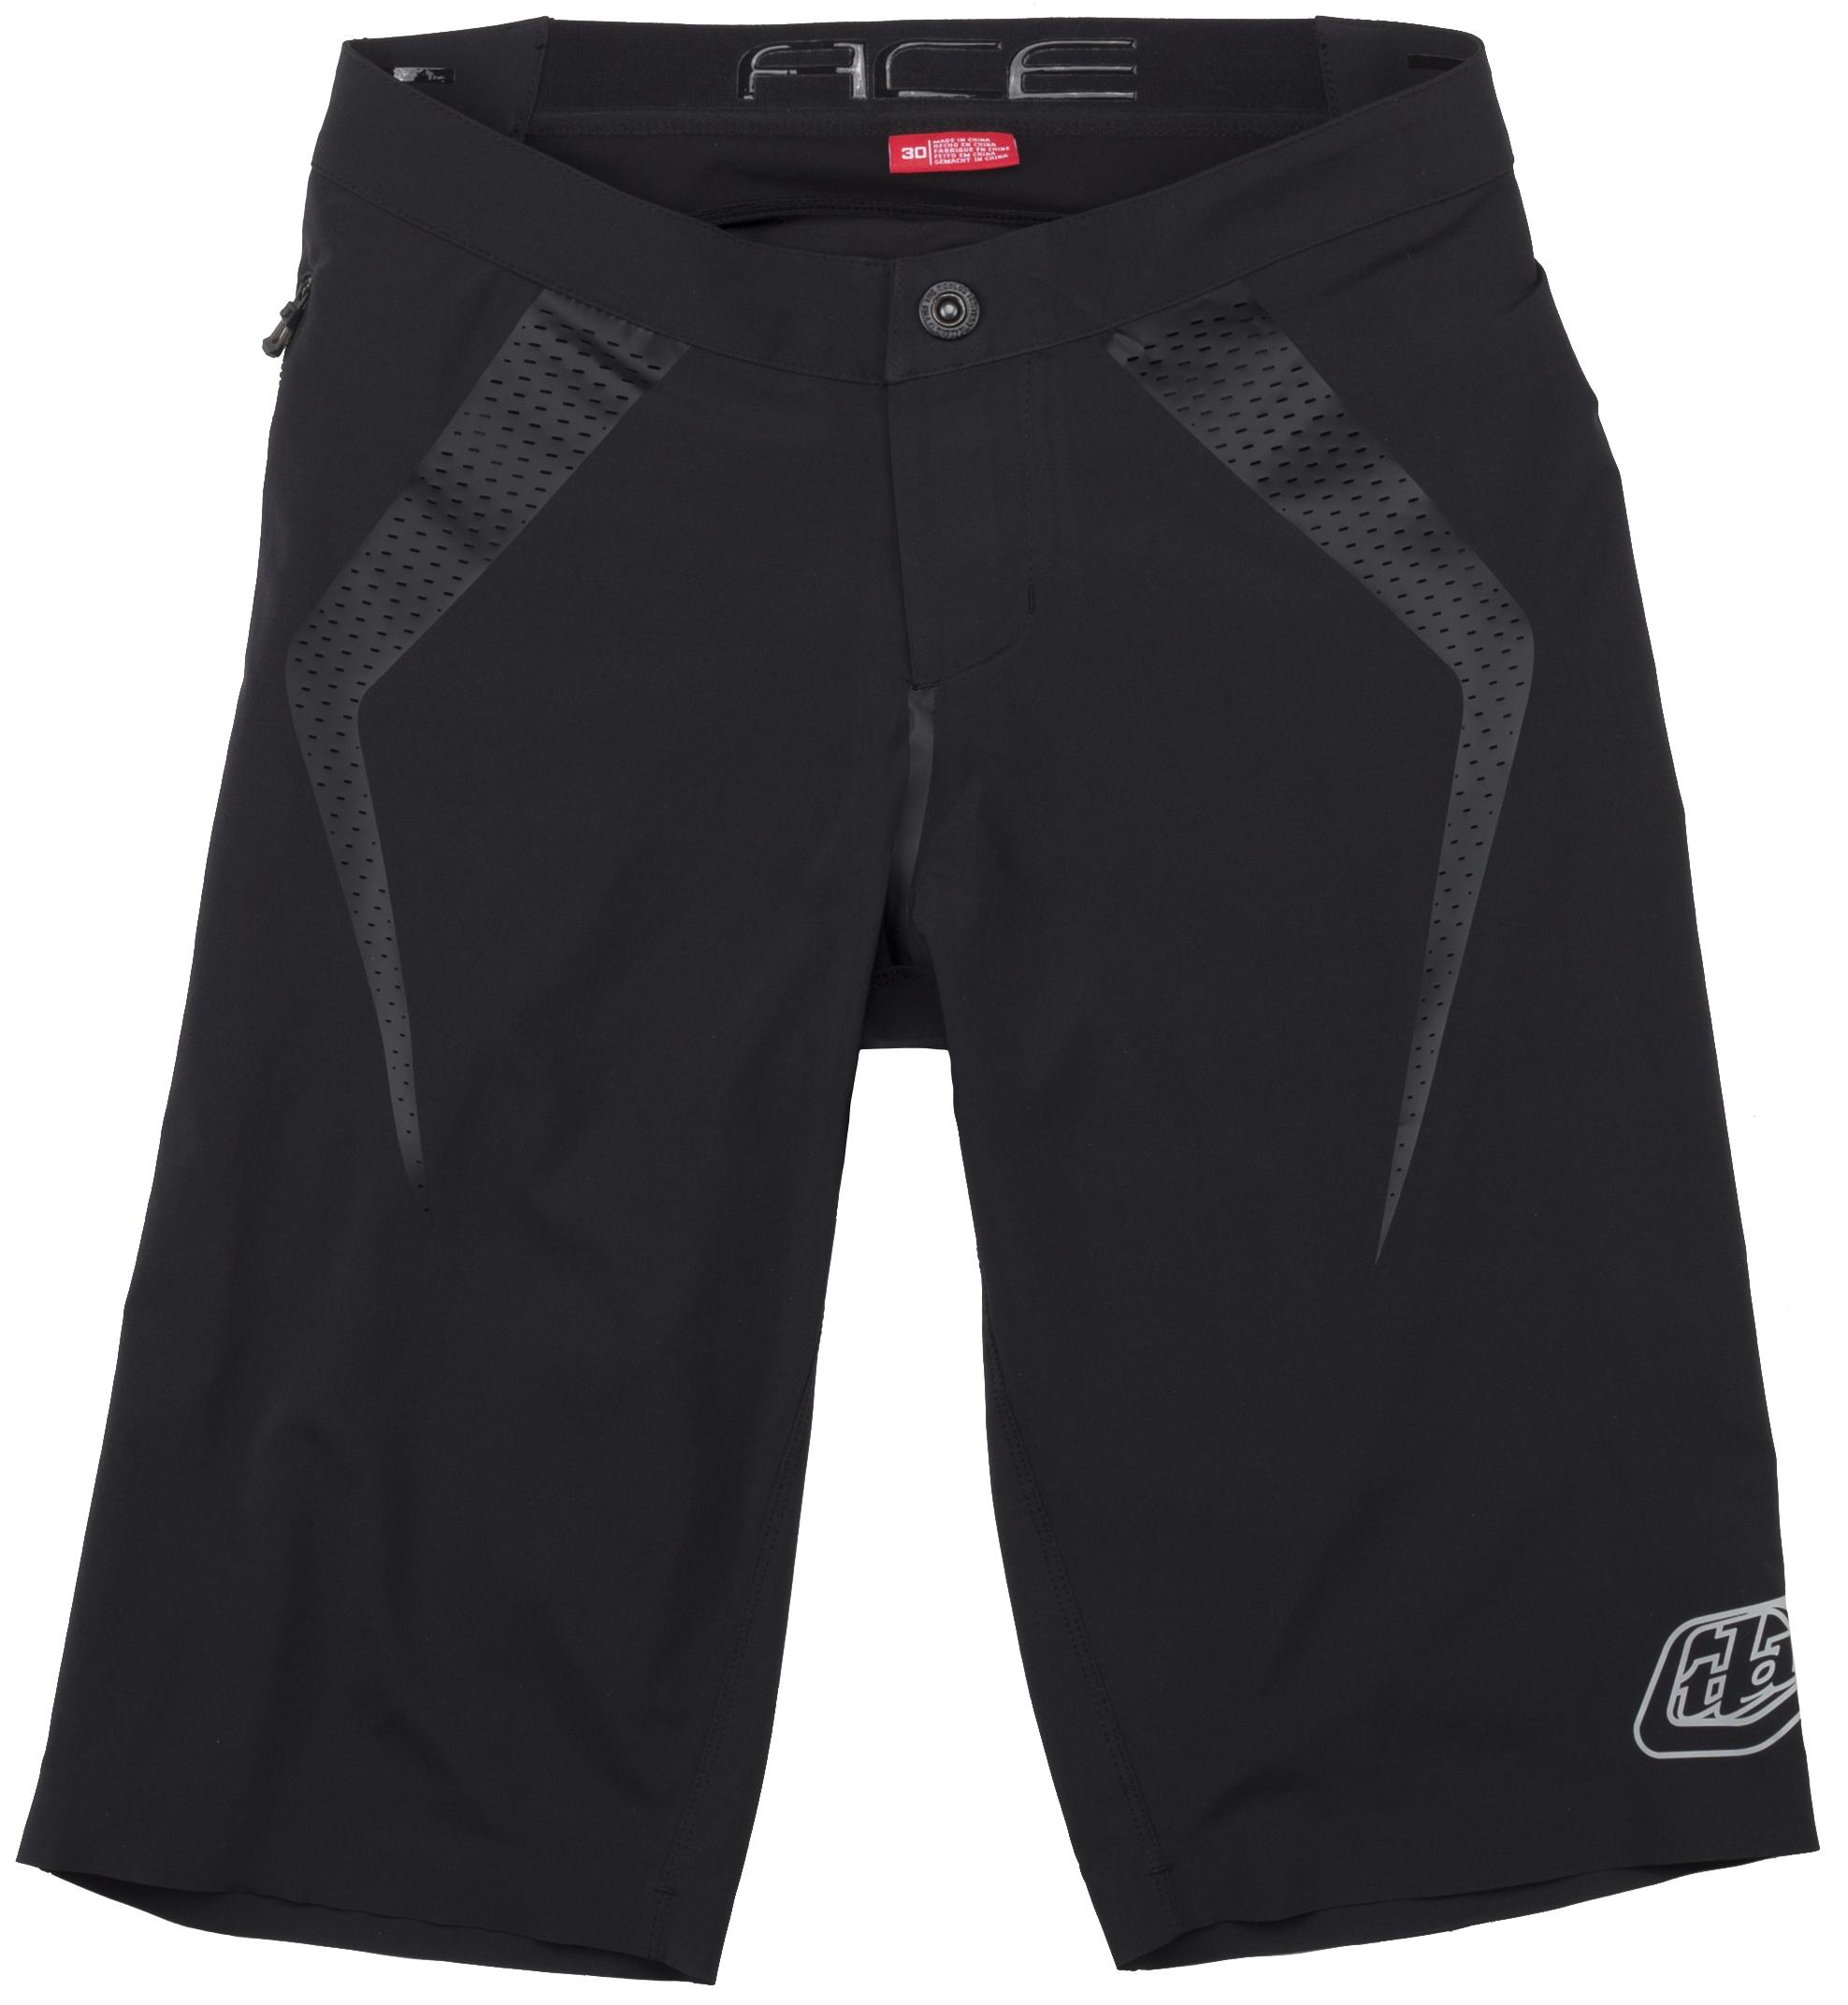 Troy Lee Designs Ace 2.0 MTB Shorts